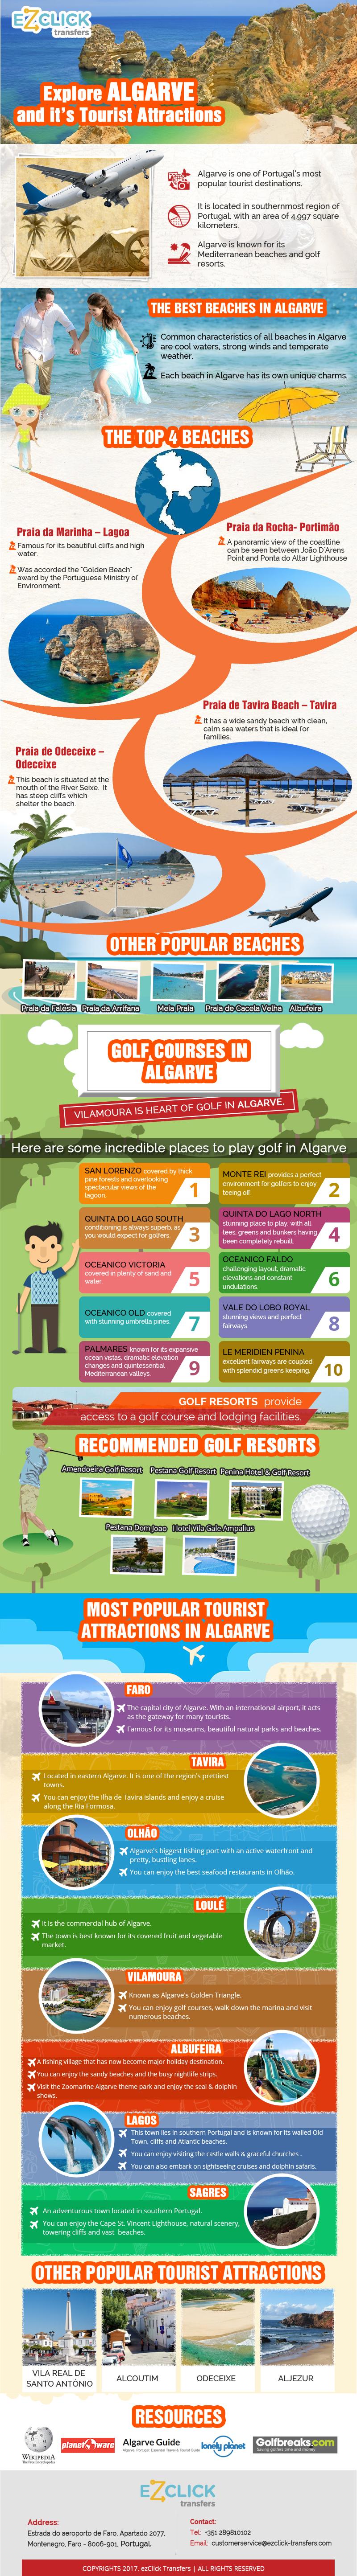 Explore Algarve And It's Tourist Attractions